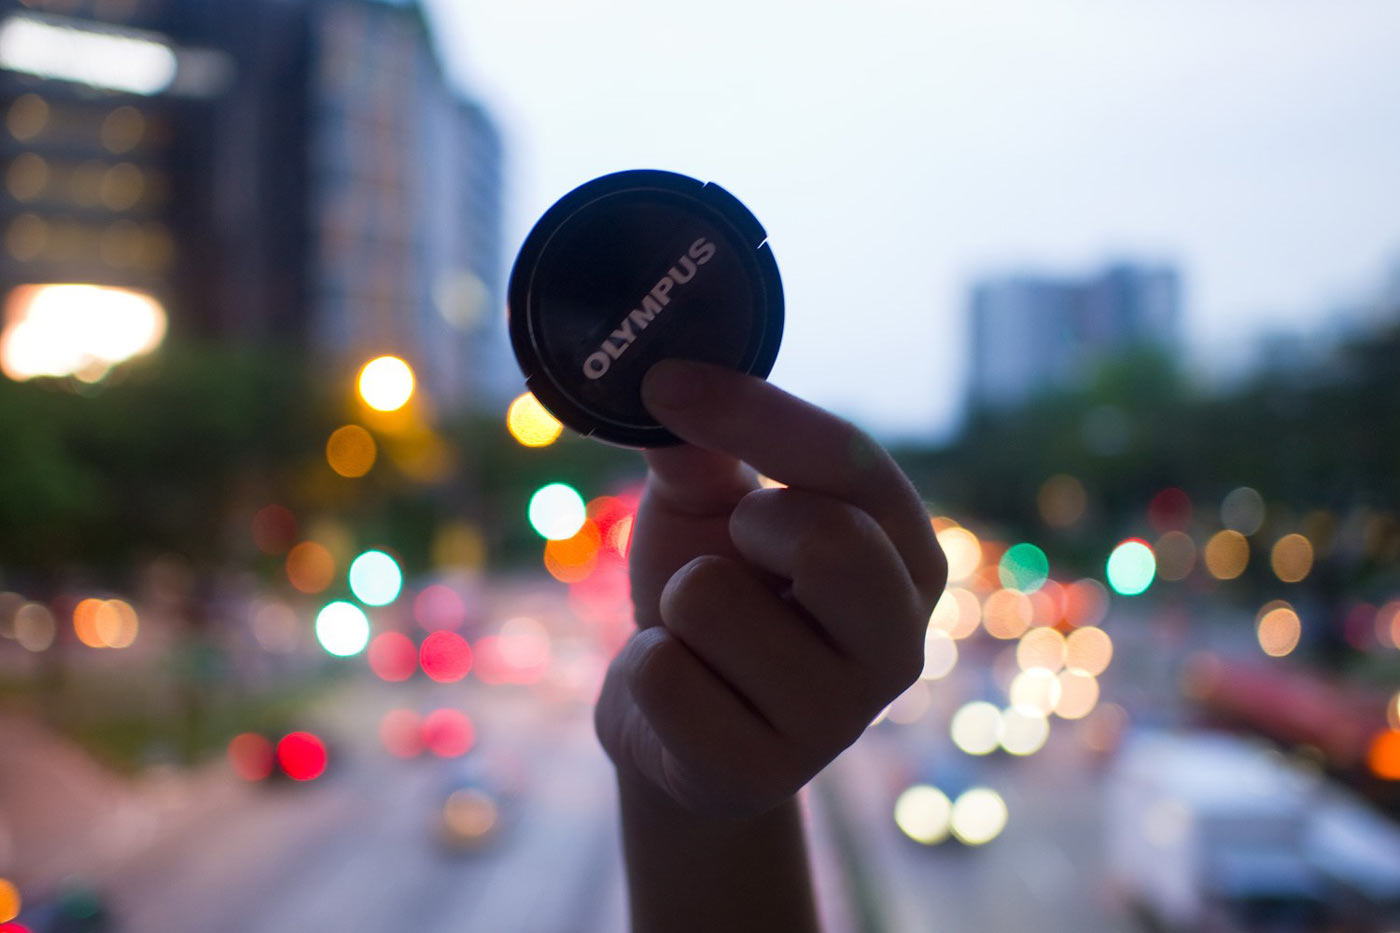 Switch to manual focus - نکاتی برای عکاسی خارج از فوکوس بوکه شهری در ساعت آبی